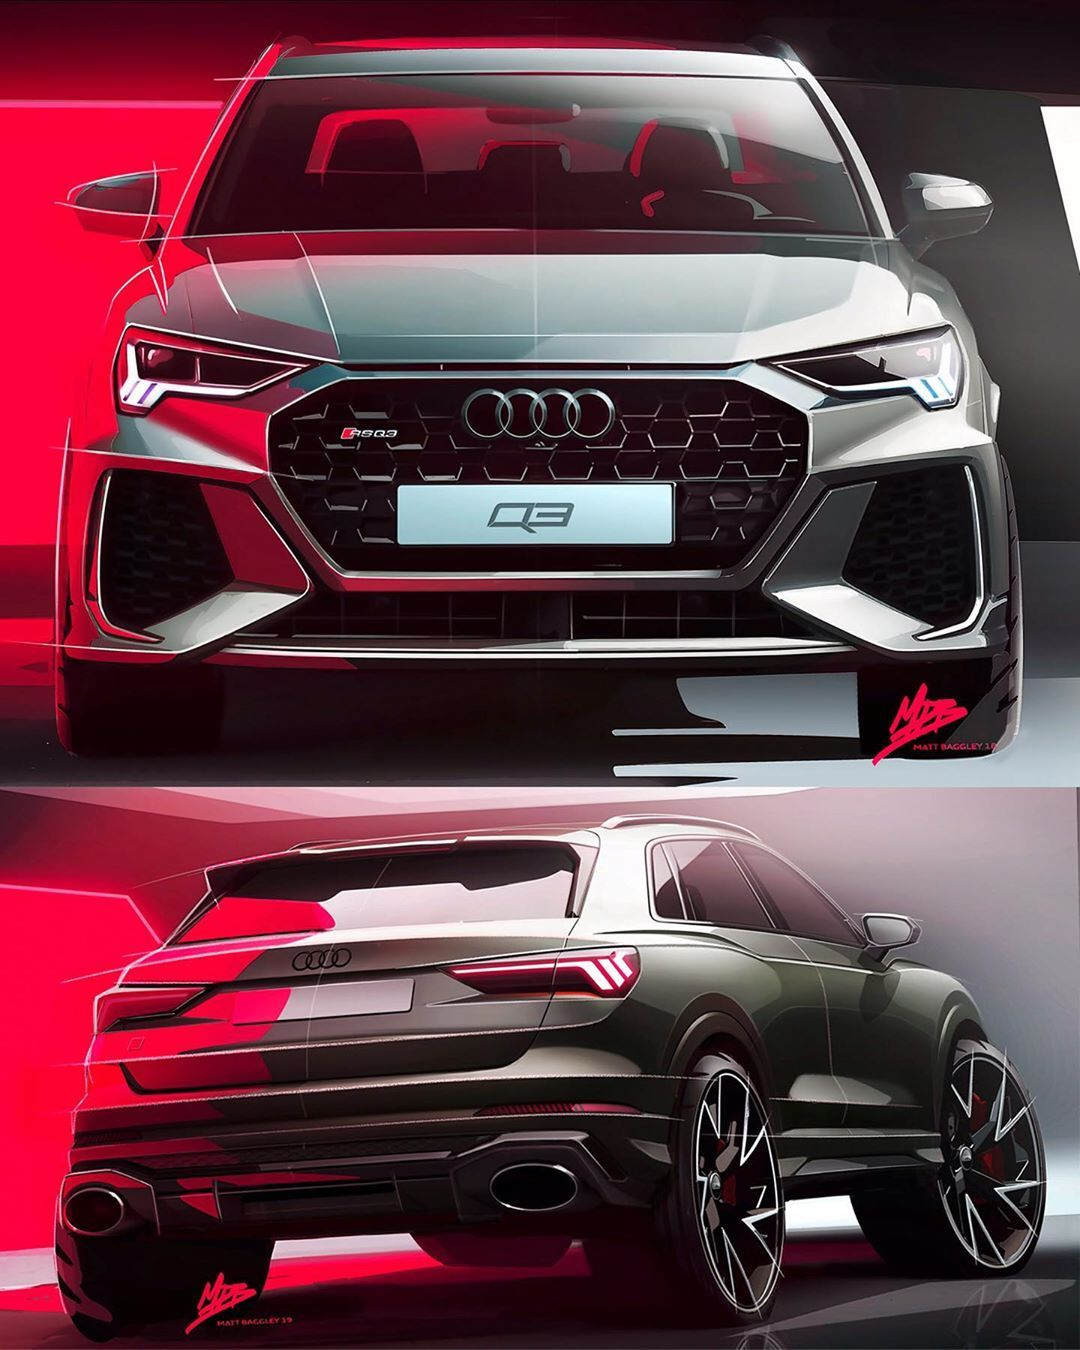 "Car Design World on Instagram: ""2020 Audi RSQ3 official sketches by Matt Baggley @matt_bagz  #cardesign #car #design #carsketch #sketch #audi #audiq3 #audirsq3 #audifans…"""